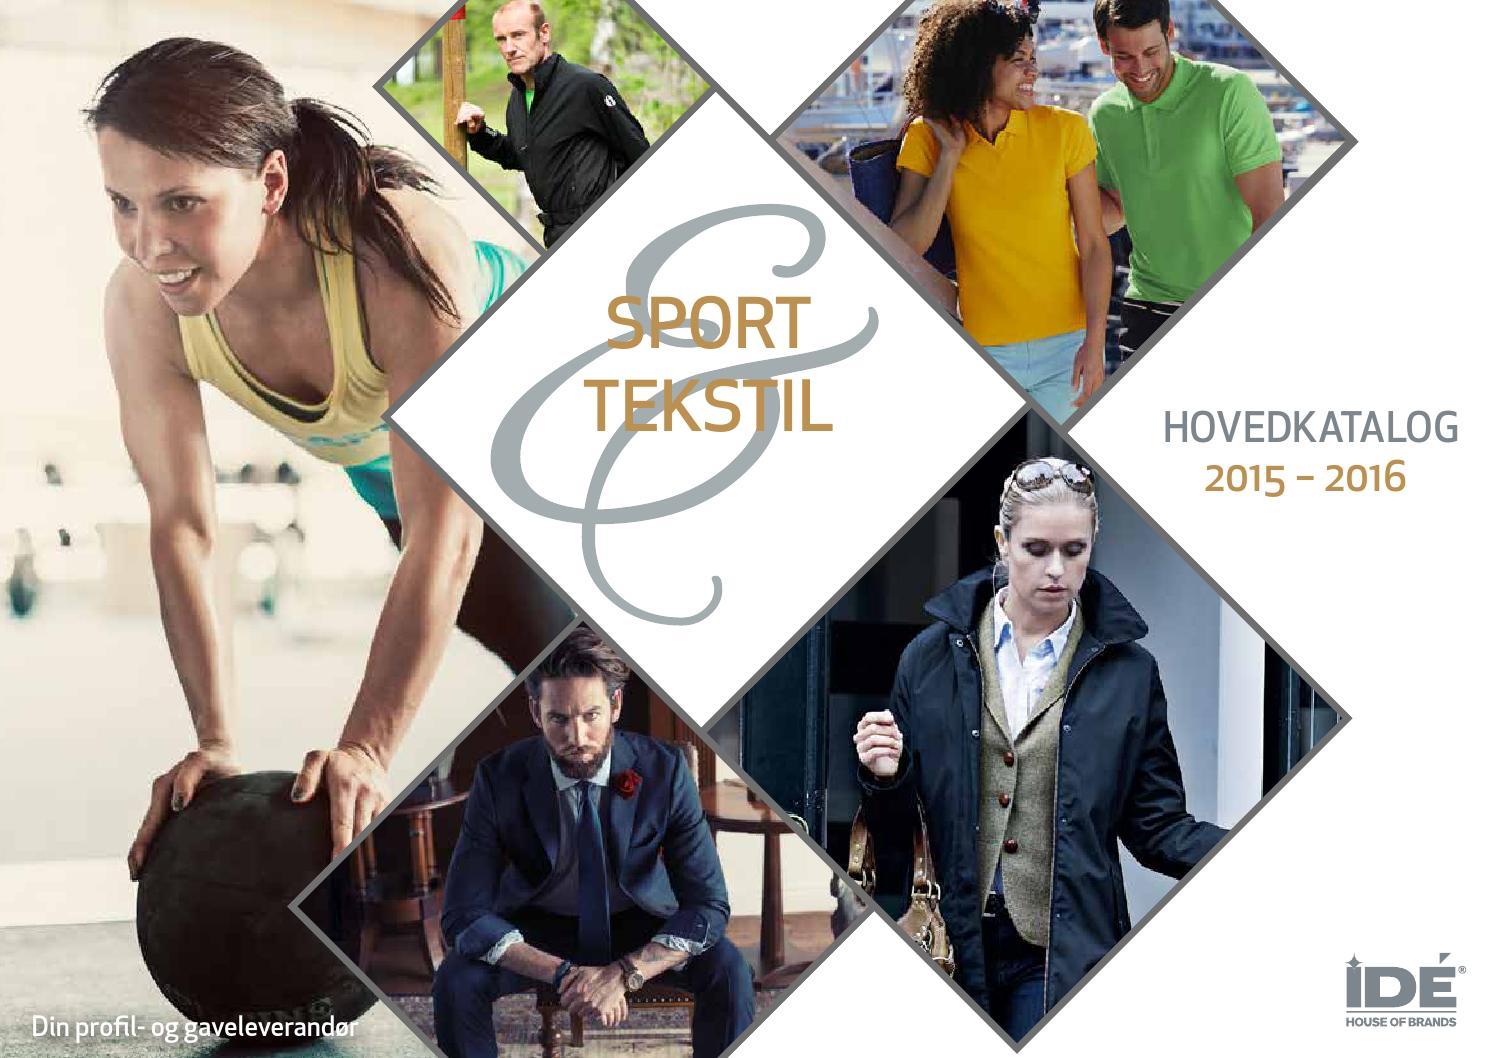 0df5952d3a09 IDÉ House of Brands Sport   Tekstil 2015-2016 by IDE House of Brands - issuu